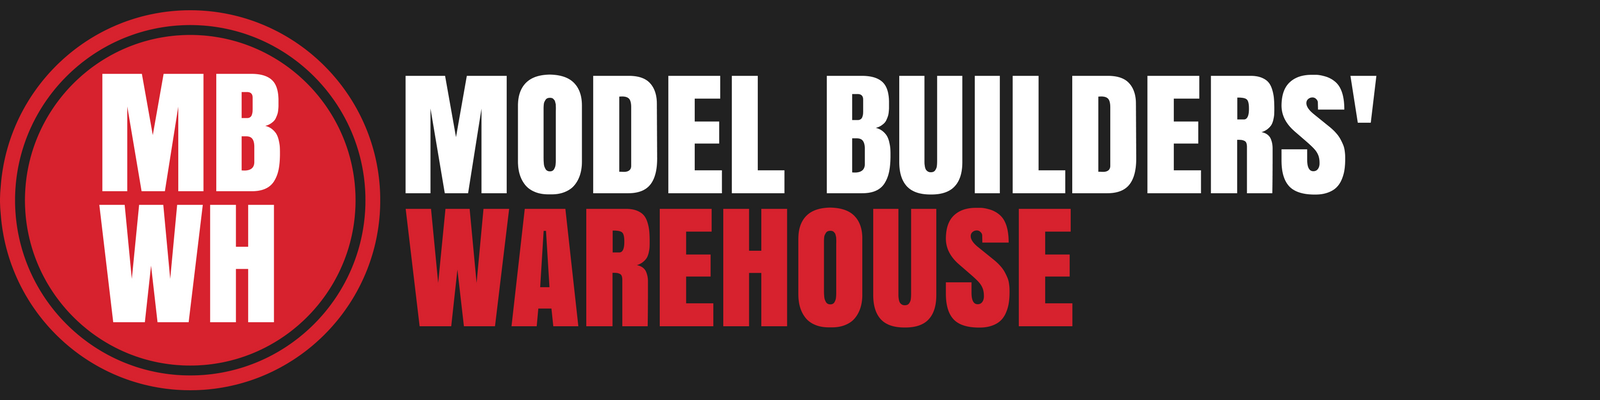 MBWH Logo 1600x400.png